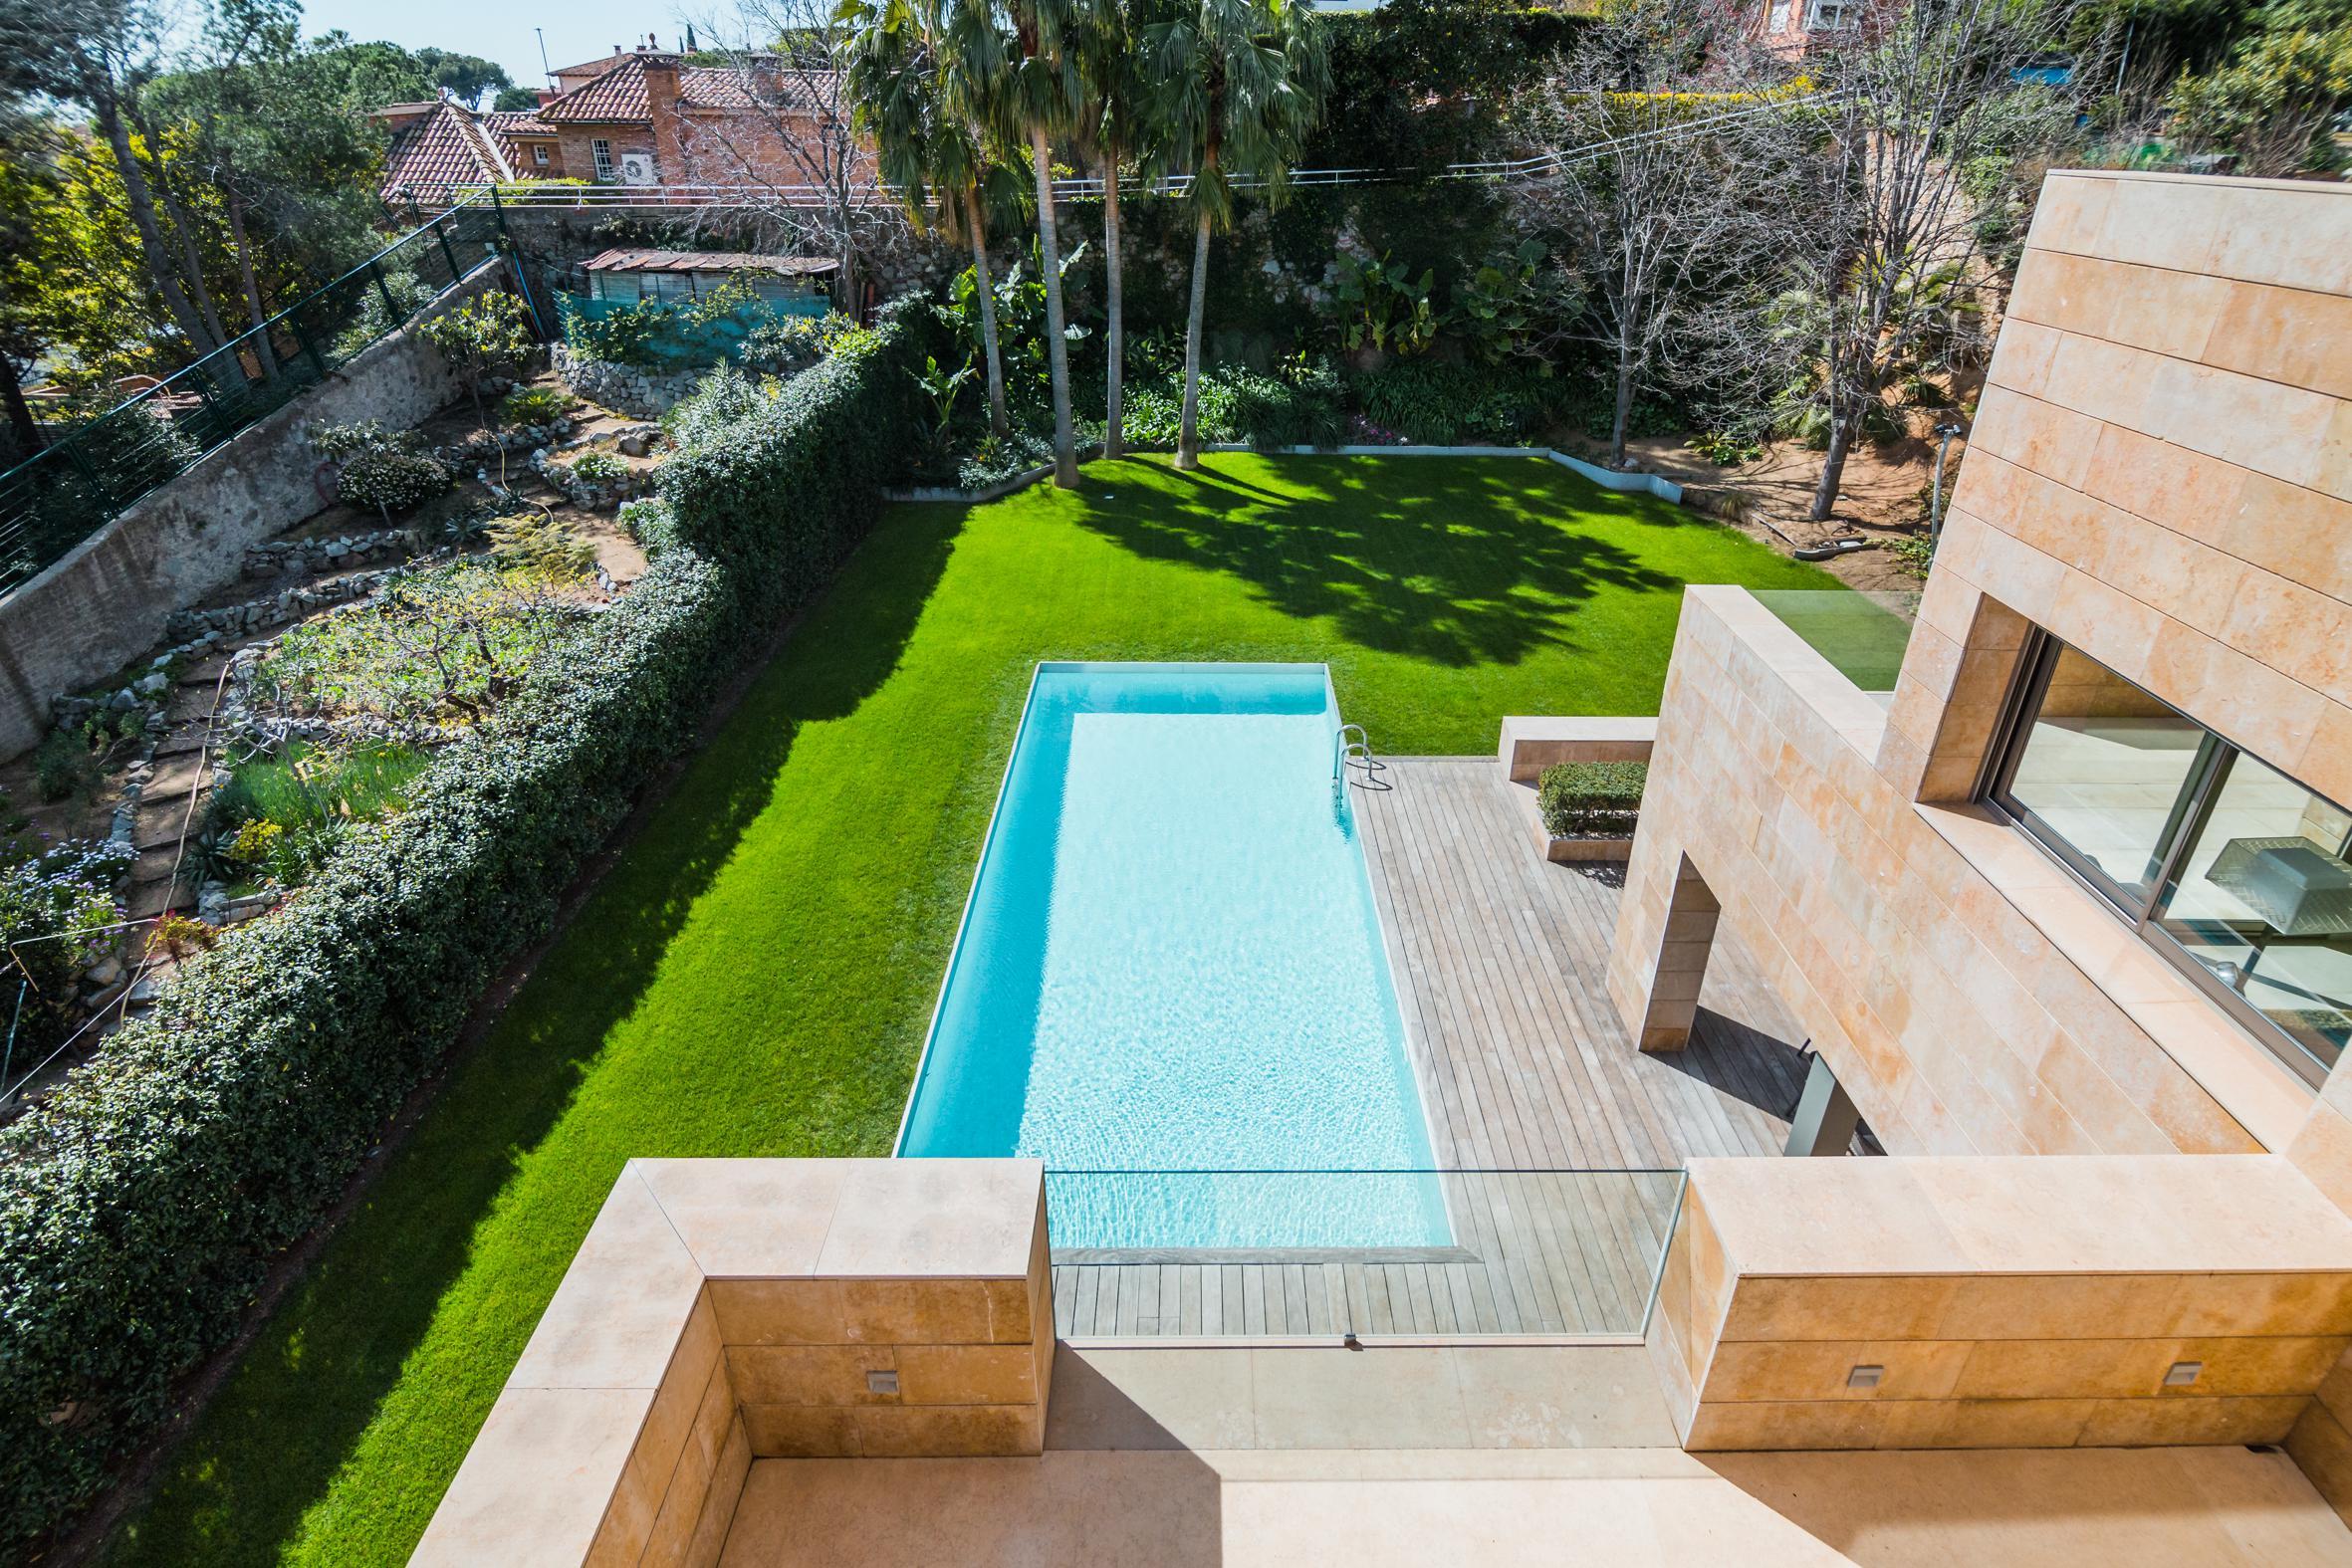 Um jardim com piscina